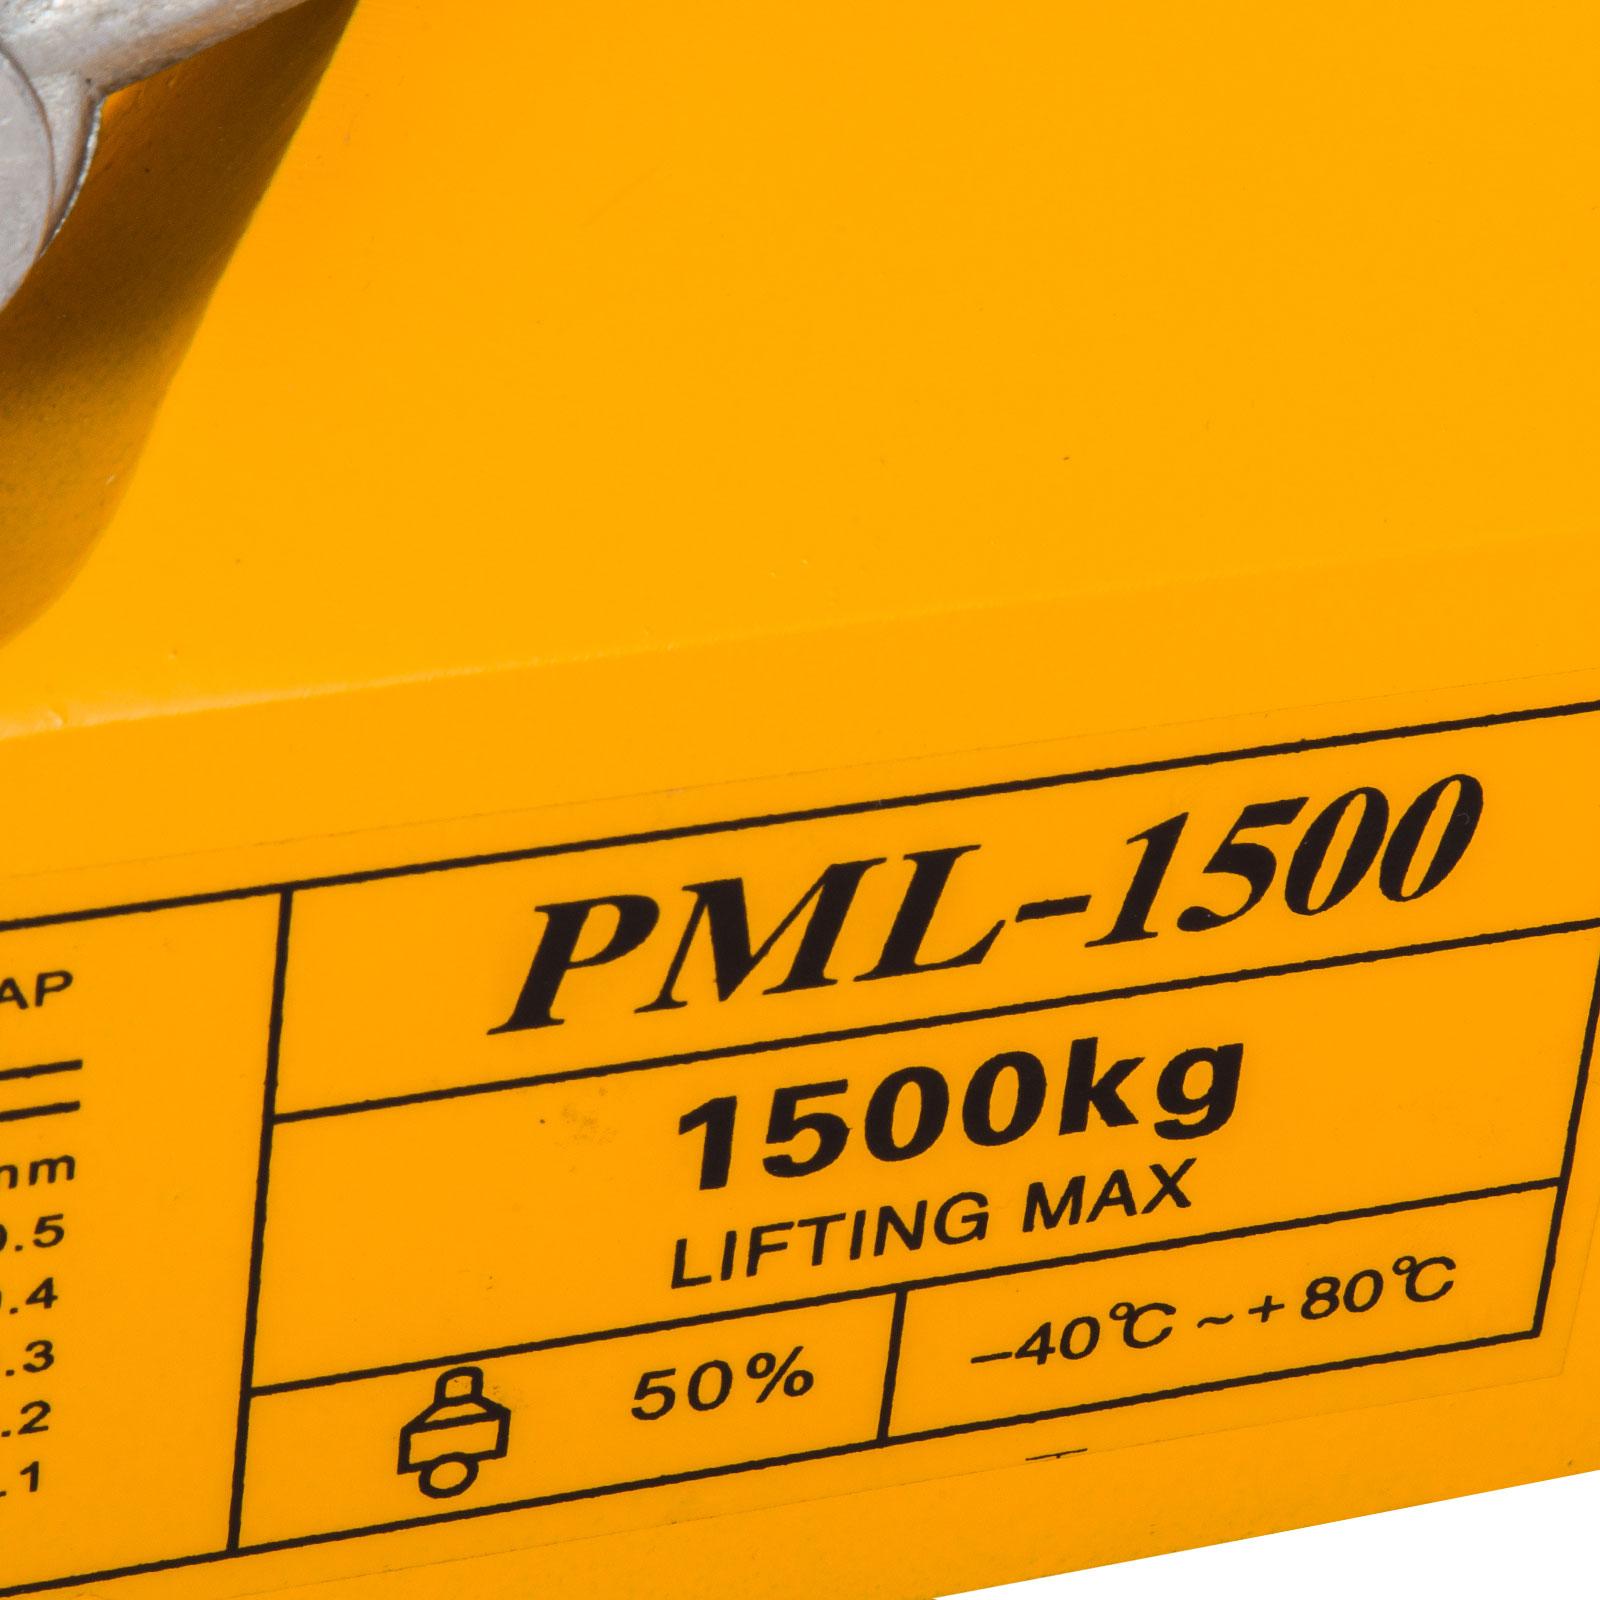 100-300-600-1000KG-Steel-Magnetic-Lifter-Heavy-Duty-Crane-Hoist-Lifting-Magnet miniature 78